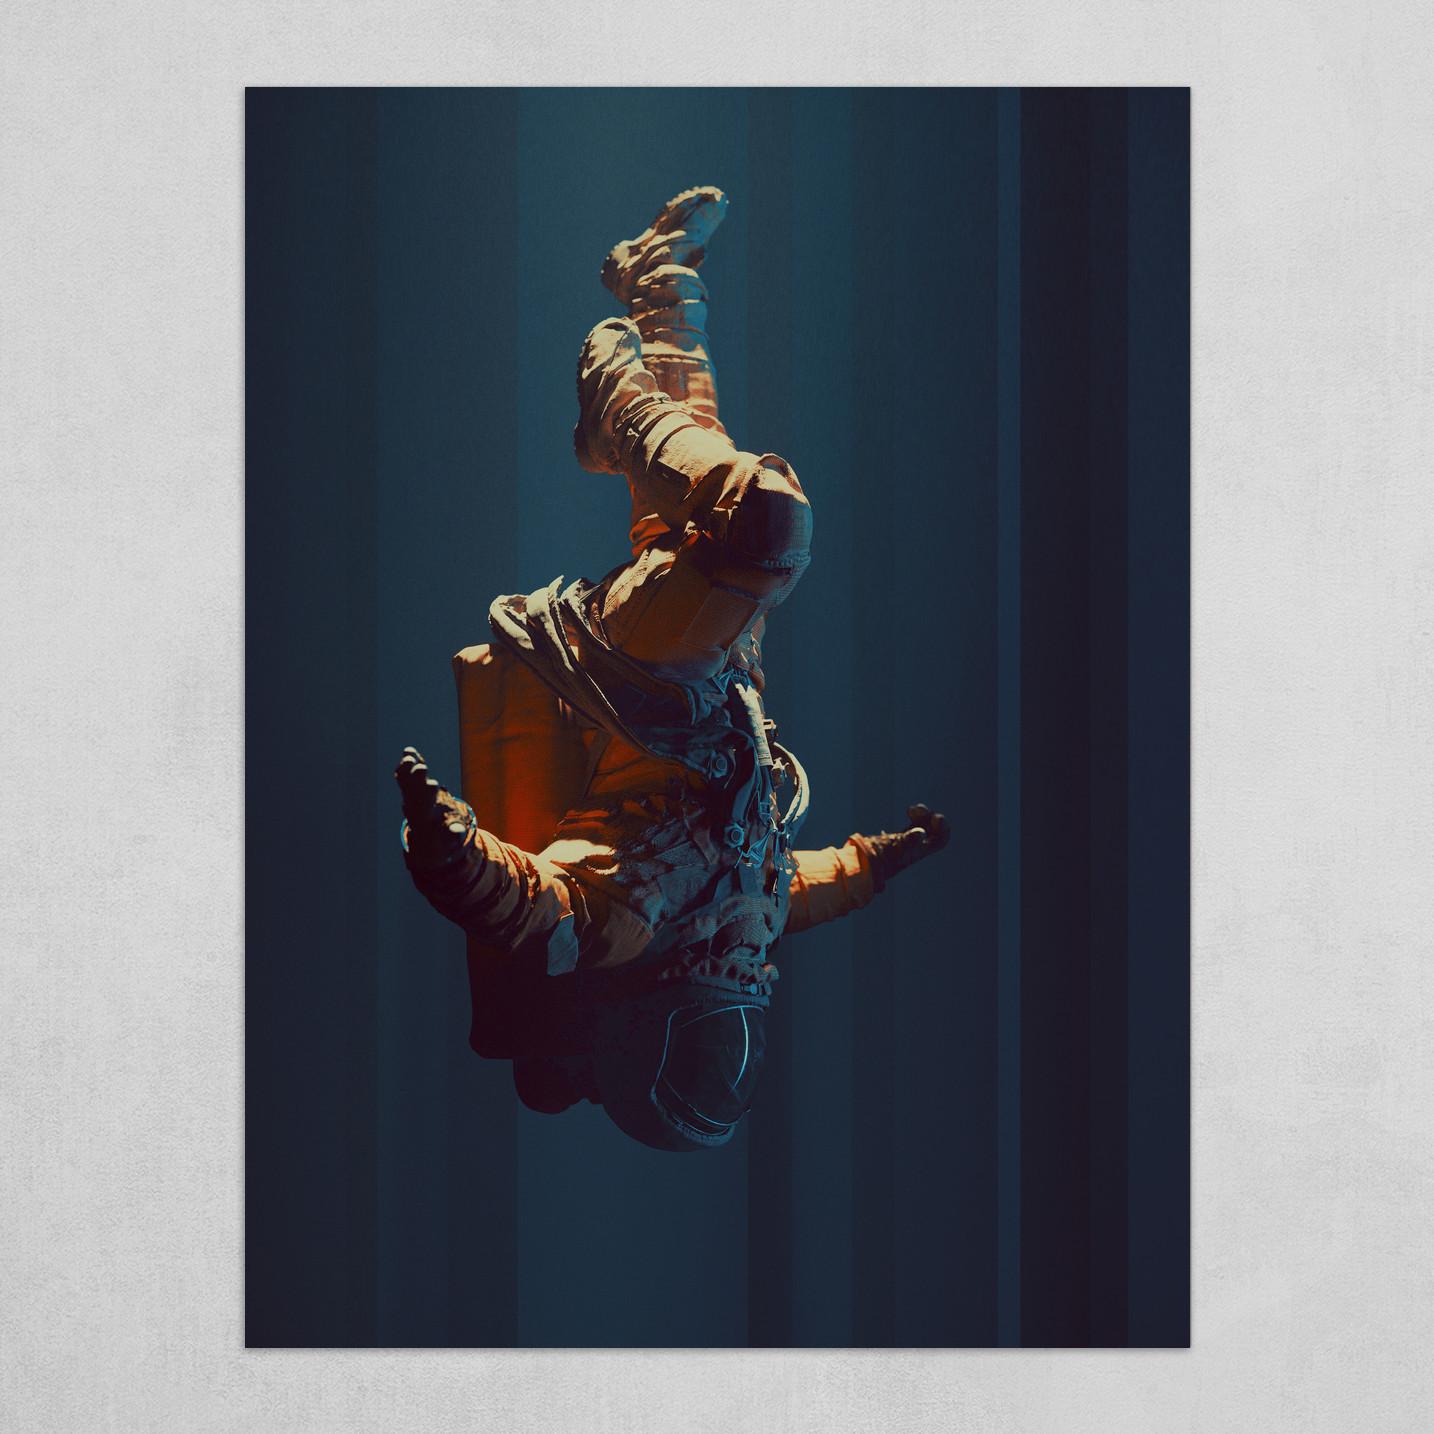 The Astronaut Falling